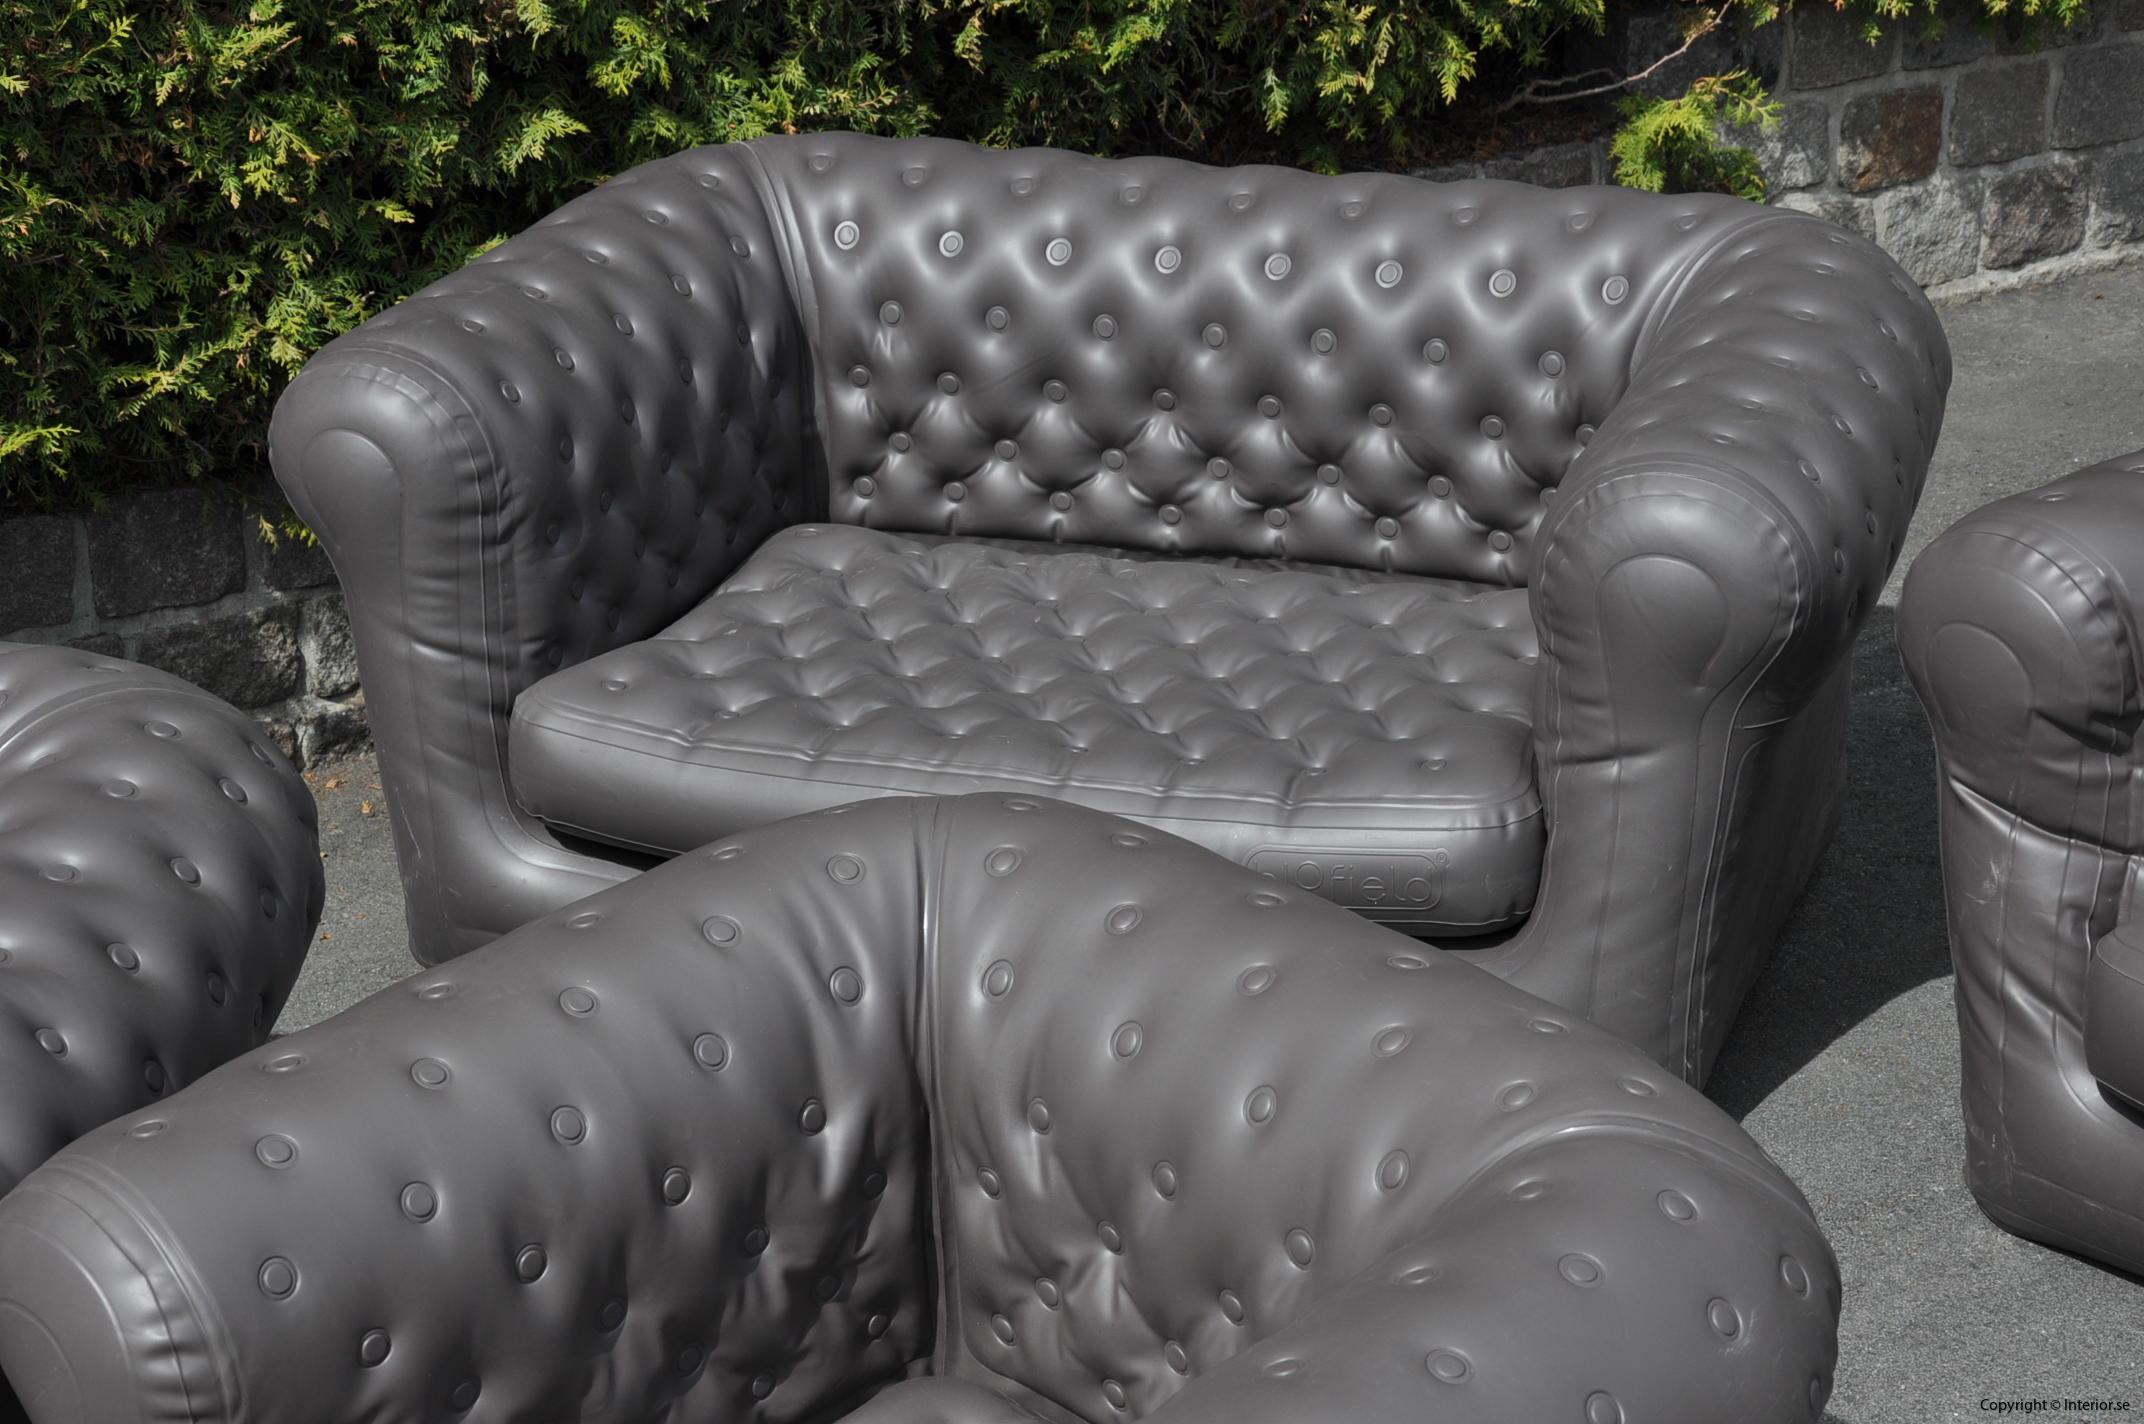 hyra uppblåsbara möbler hyr möbler event stockholm blofield furniture event sweden (6)